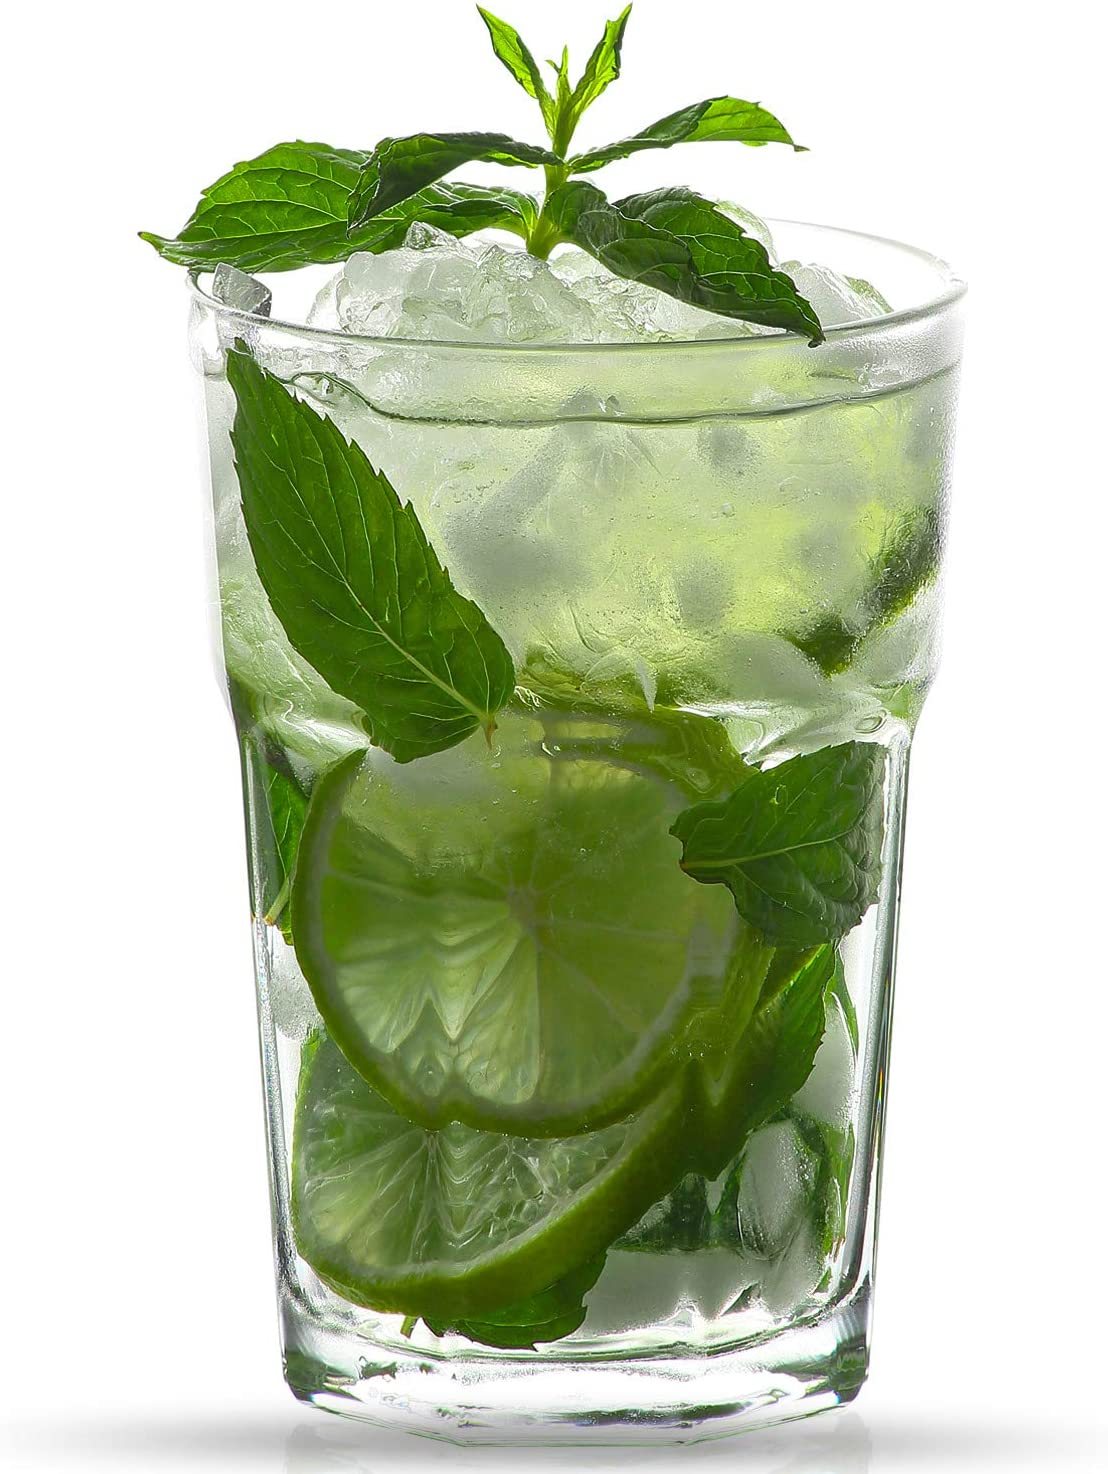 Set of 6 Glasses for Water Soda Beer Coke Coctails Cold Beverages Drinks 12.25 OZ